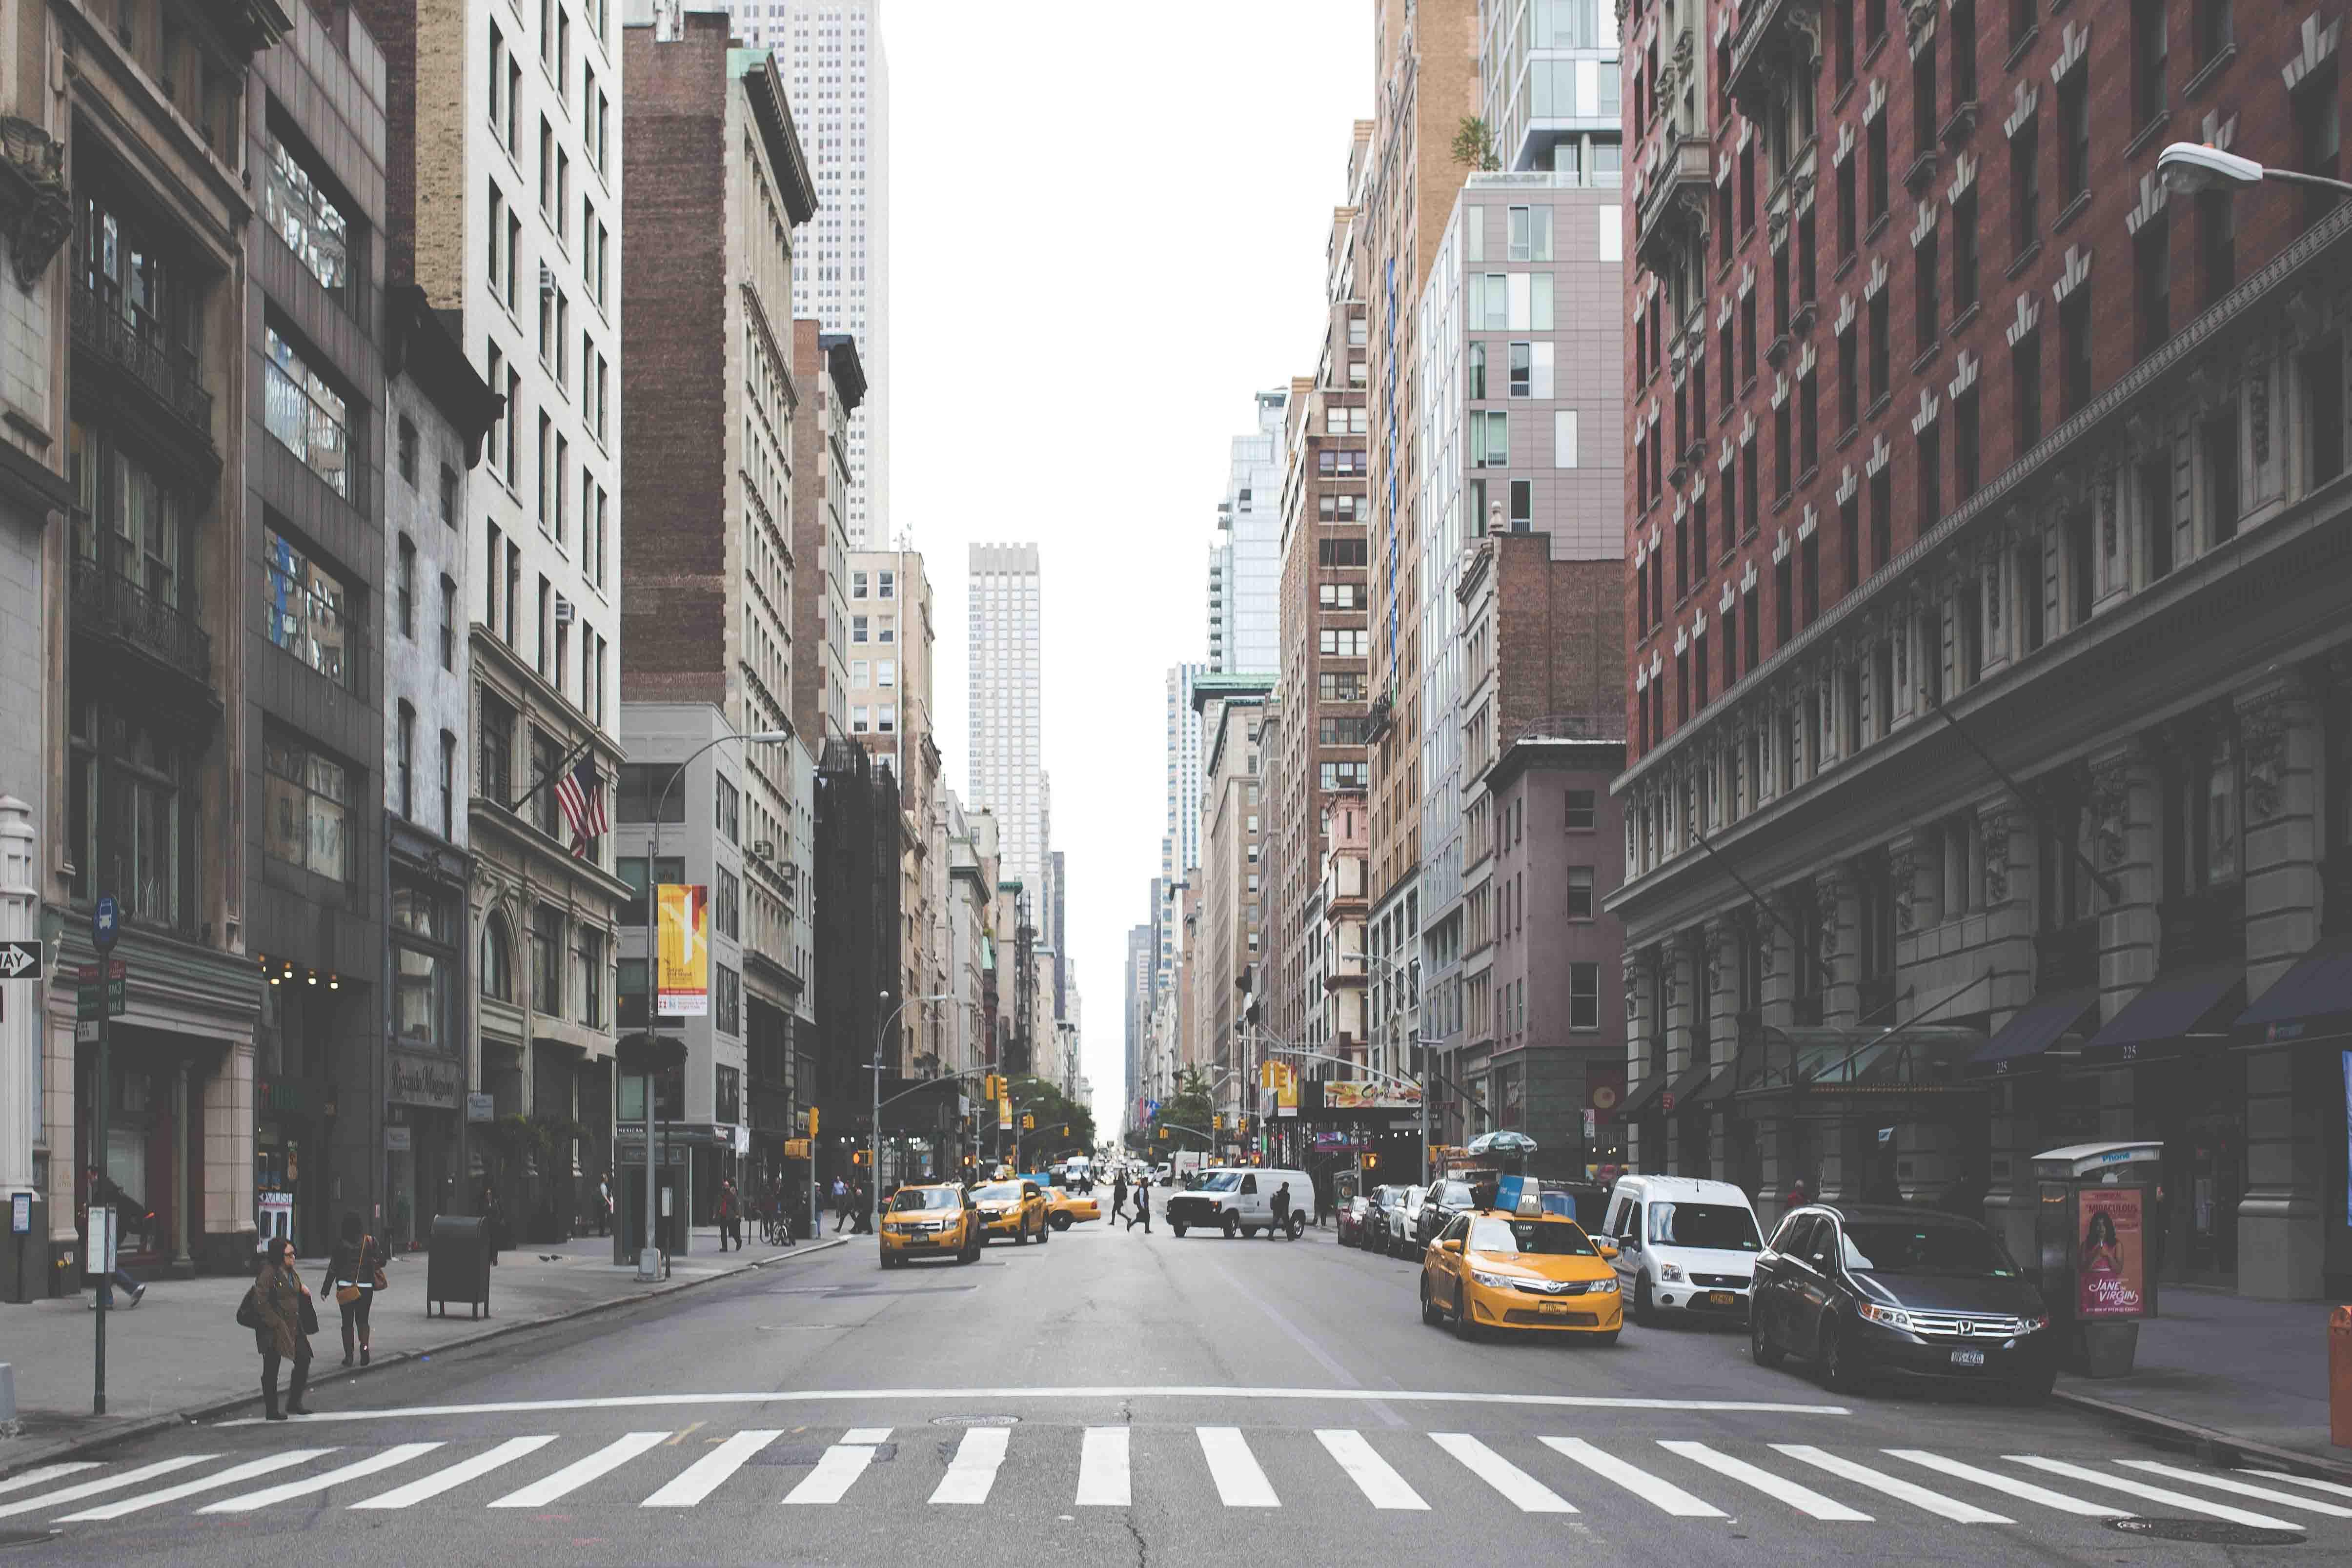 Consejos Sobre Como Alquilar Un Apartamento En Un Mercado Competitivo